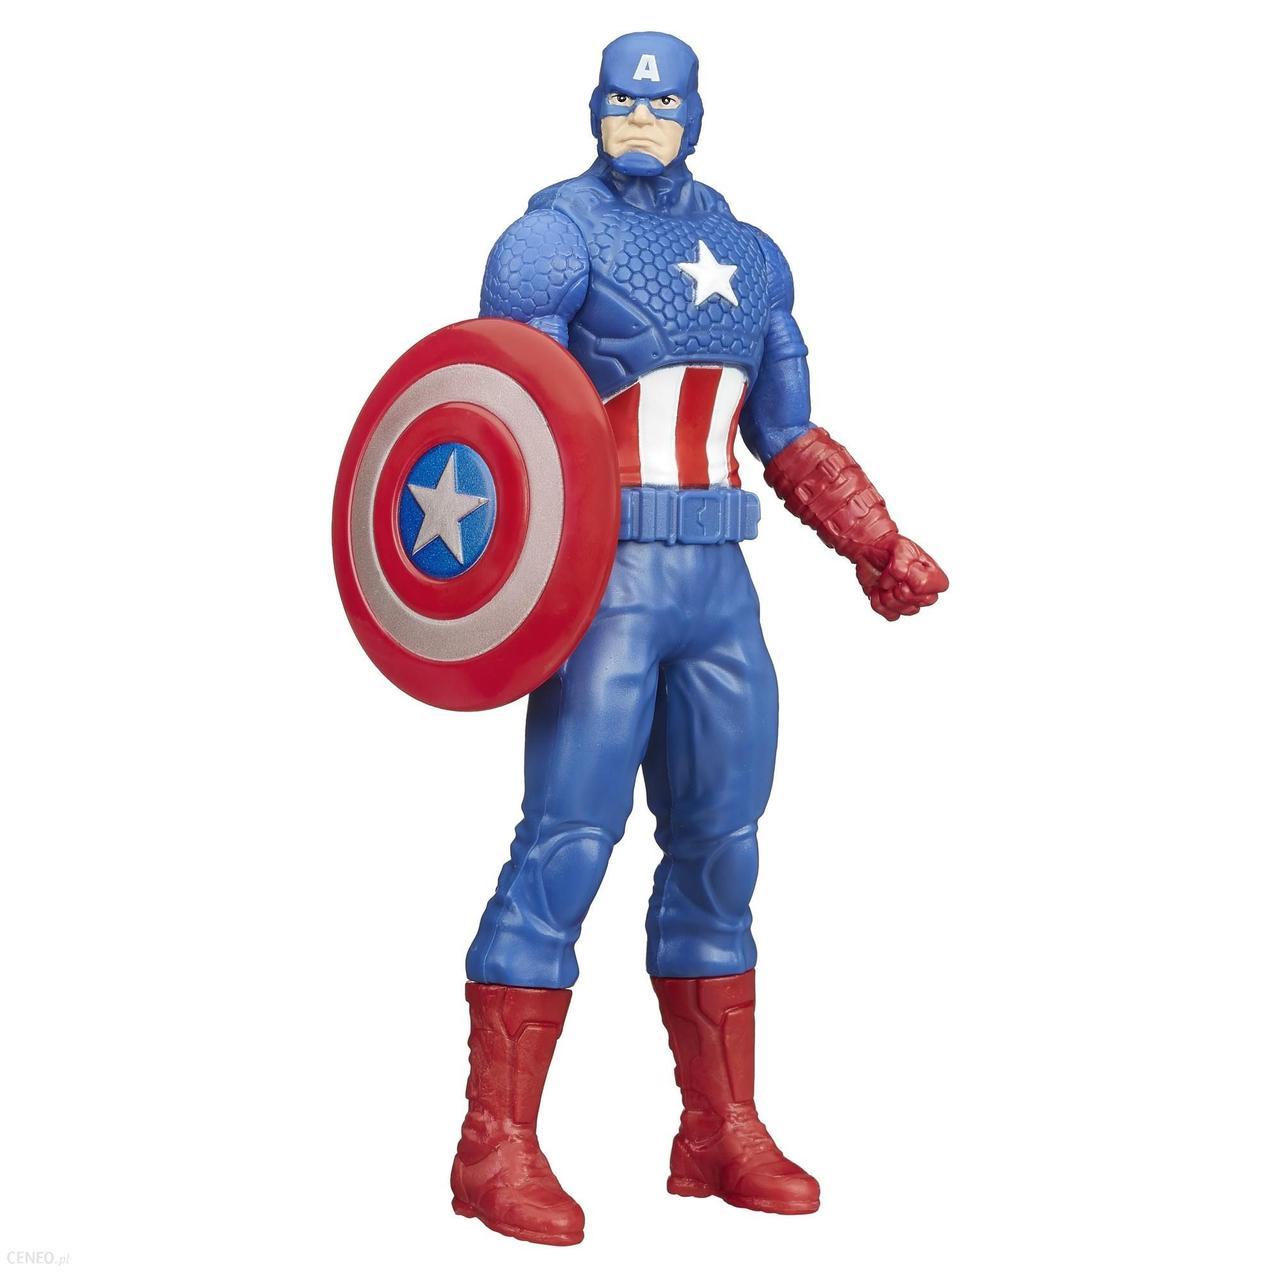 Фигурка Капитан Америка высотой 15 см. Оригинал Hasbro B1815/B1686